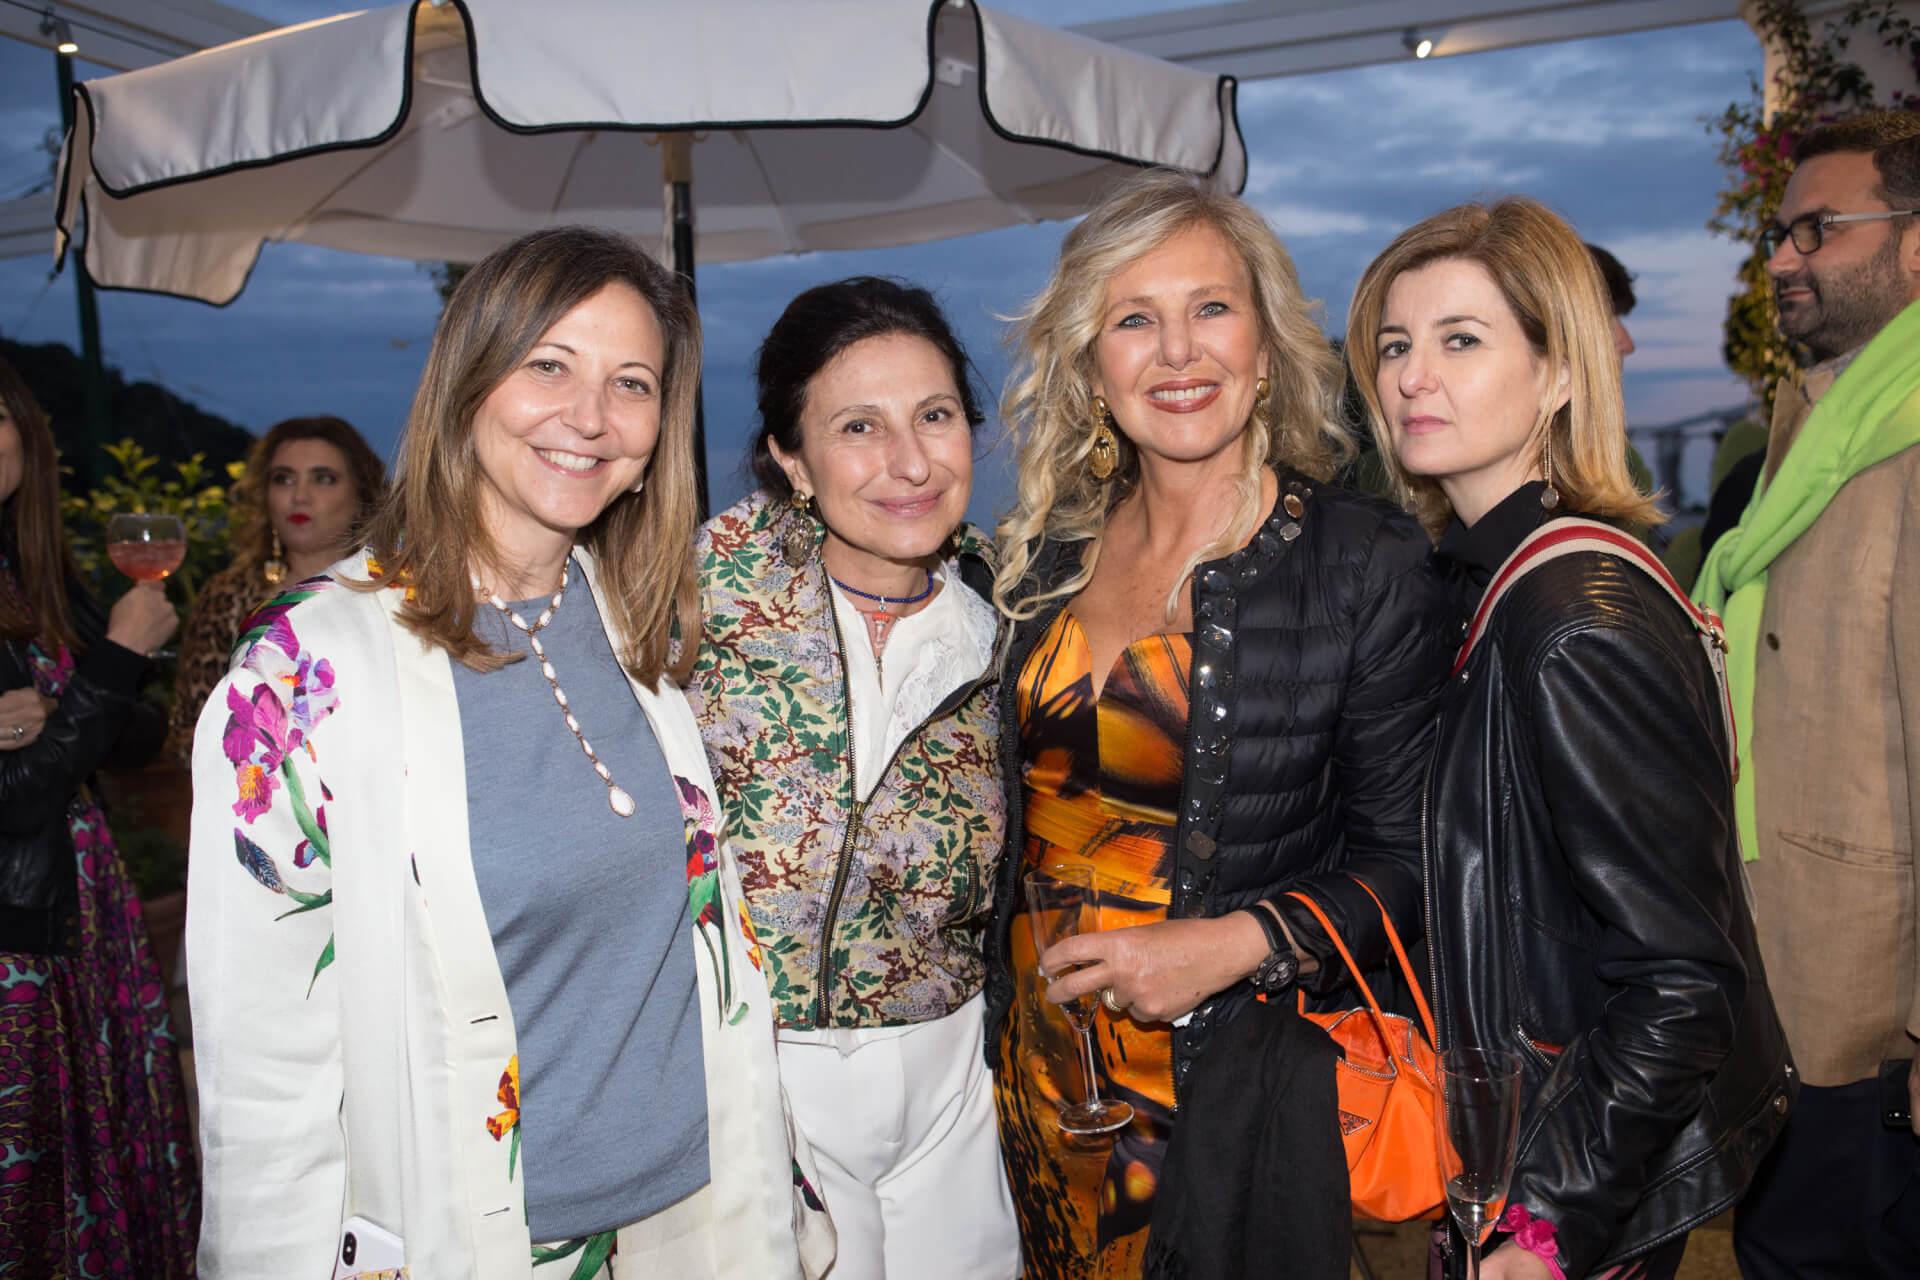 Elena Aceto di Capriglia, Maria Elena Aprea, Diana Palomba, Katjia Rossi